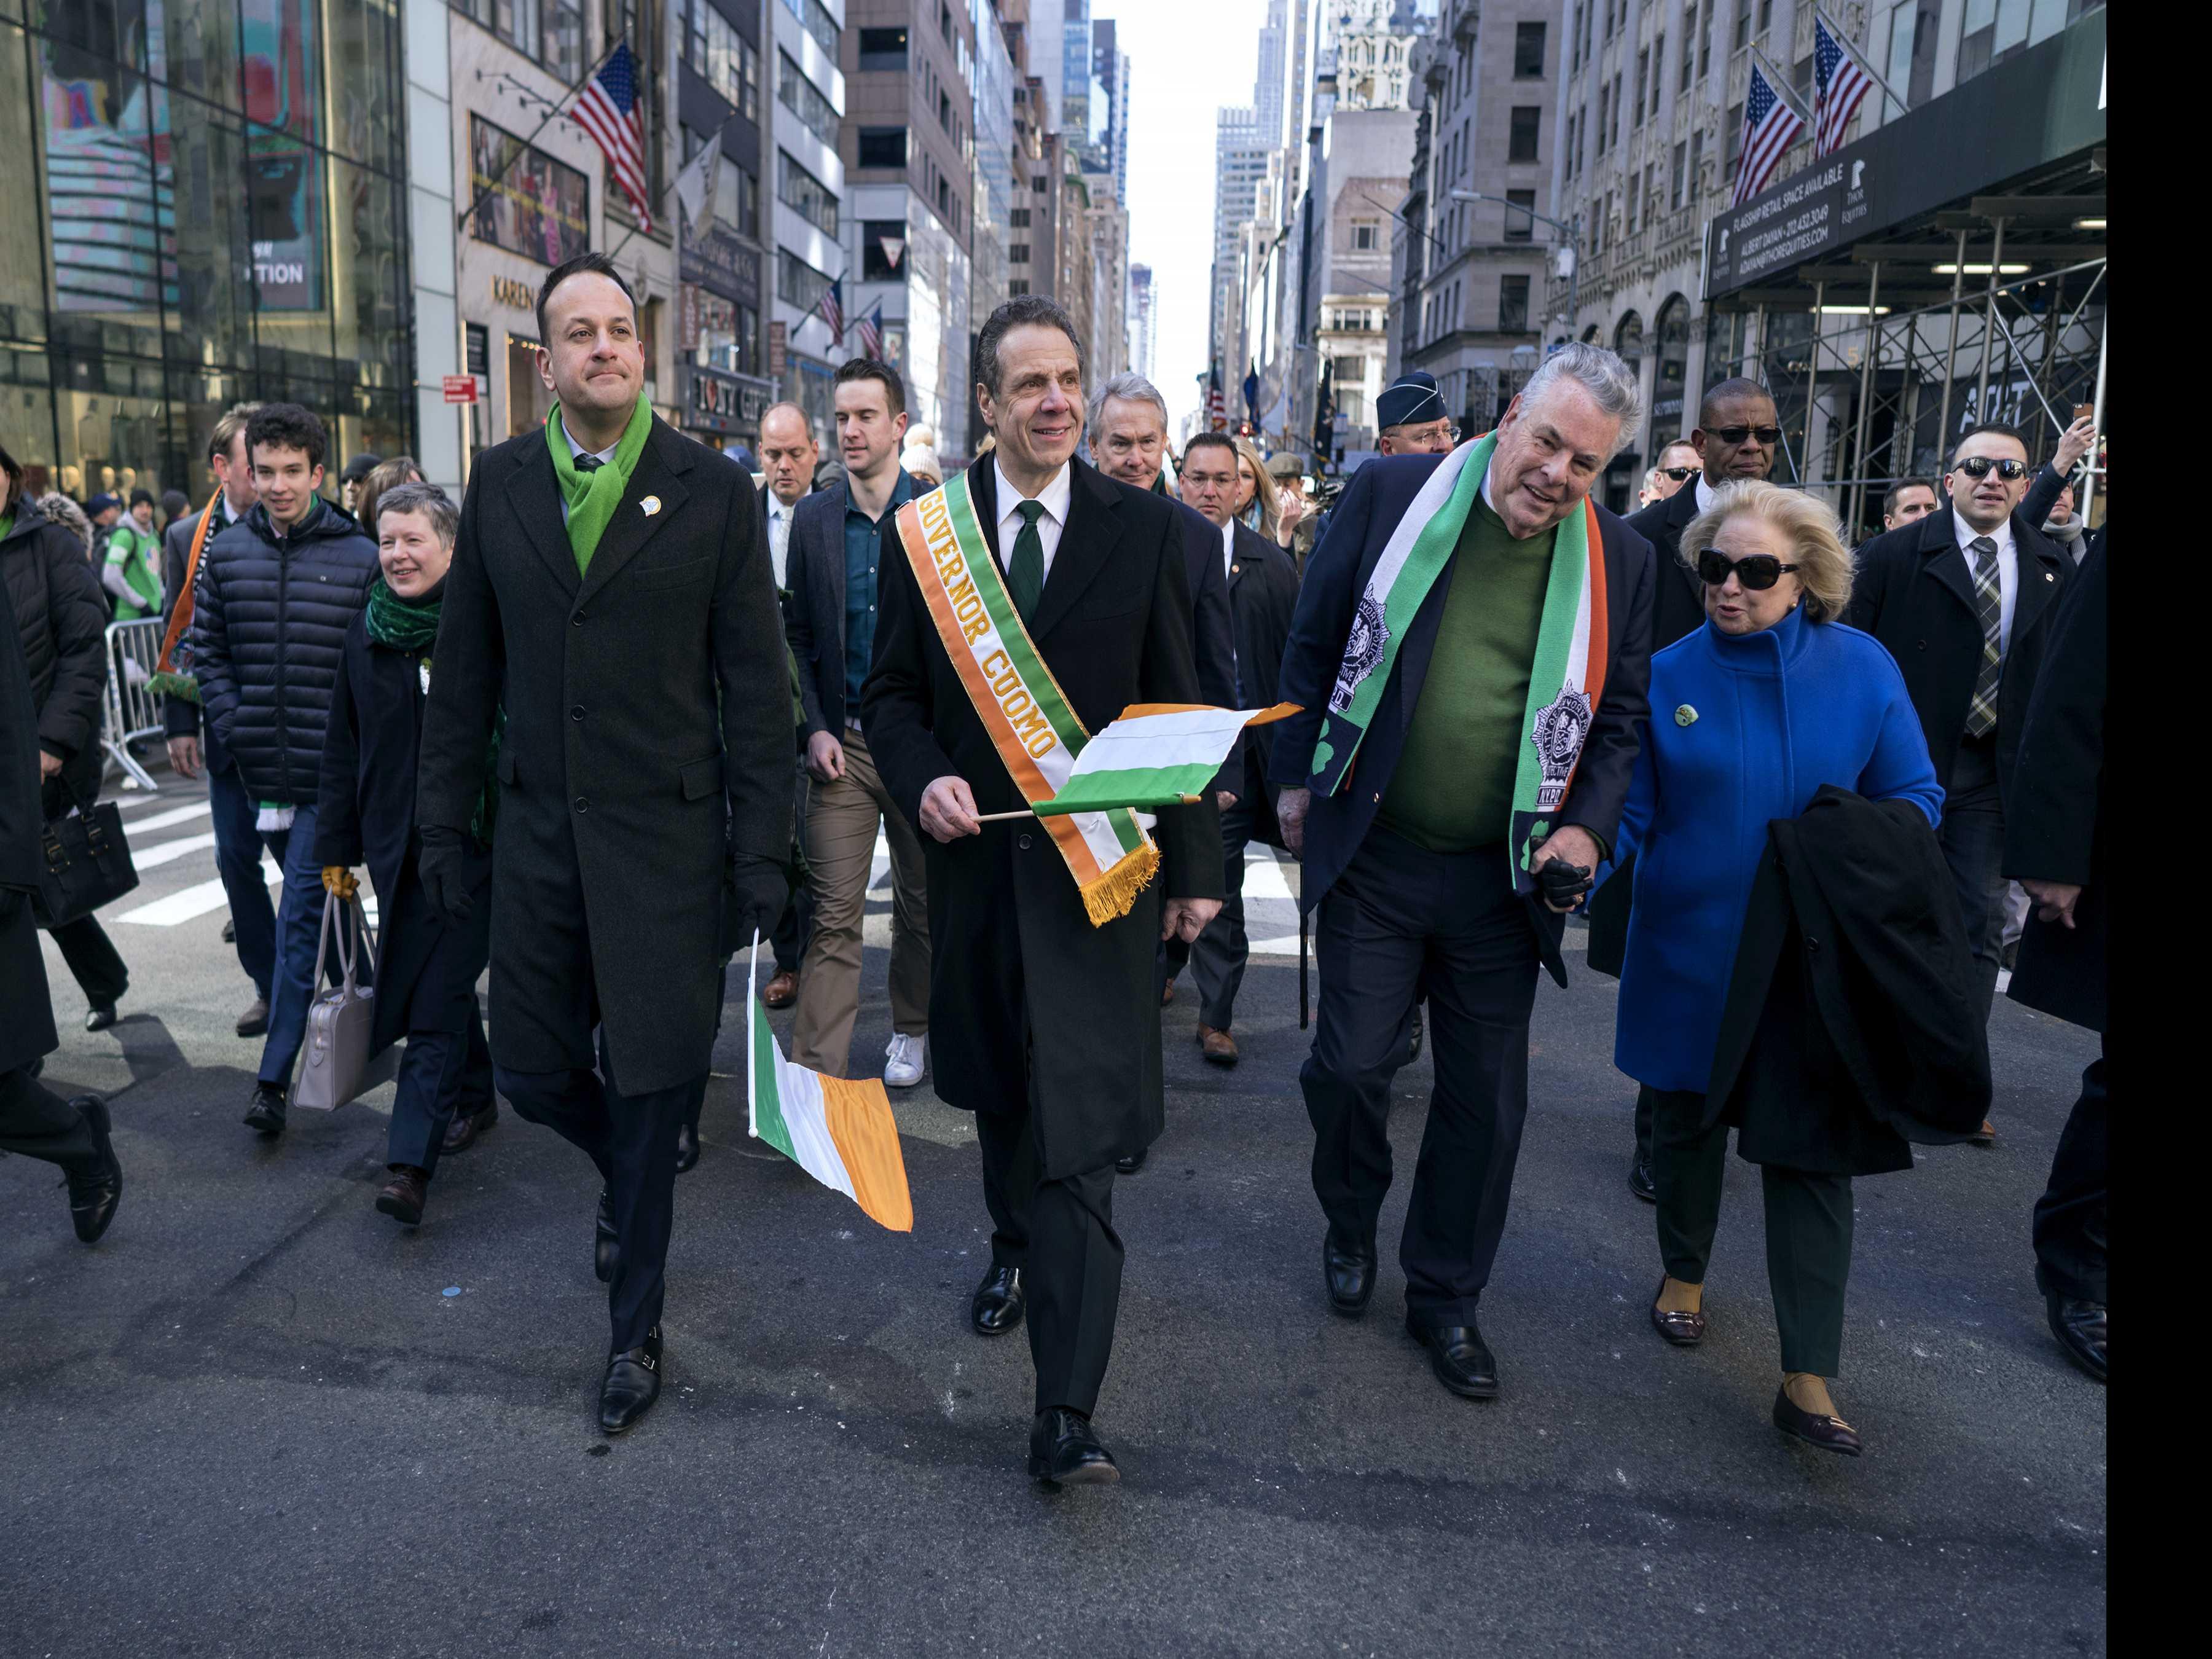 Irish Prime Minister Leo Varadkar Joins St. Patrick's Parade